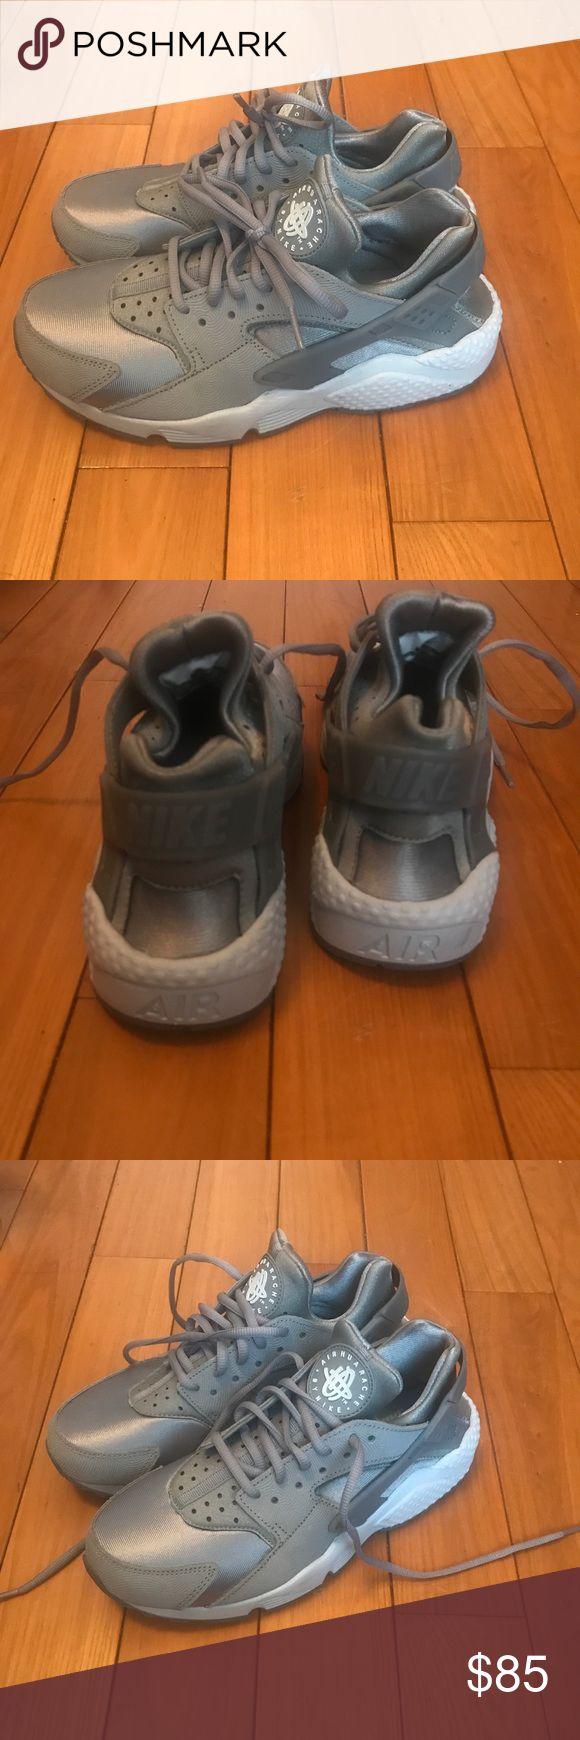 AIR HUARACHE BY NIKE Lightly worn grey huarache sneakers Nike Shoes Sneakers